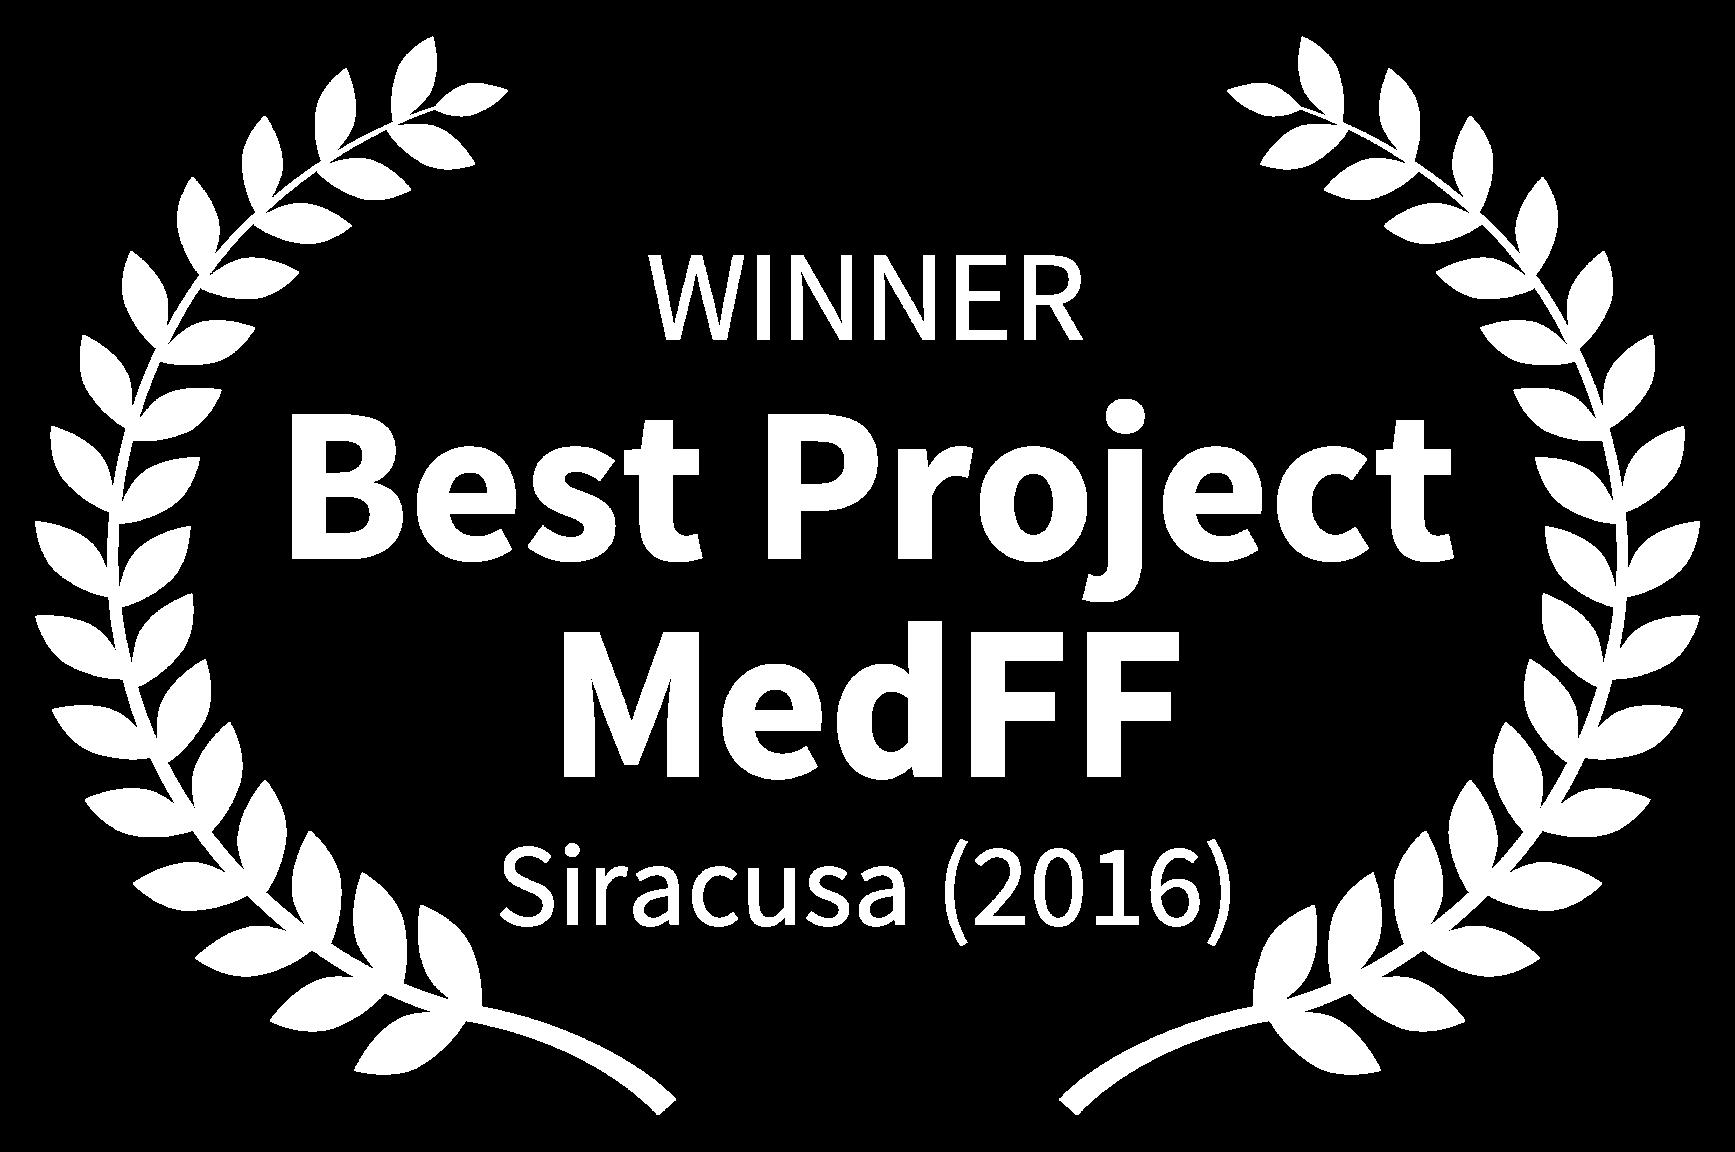 WINNER - Best Project MedFF - Siracusa 2016